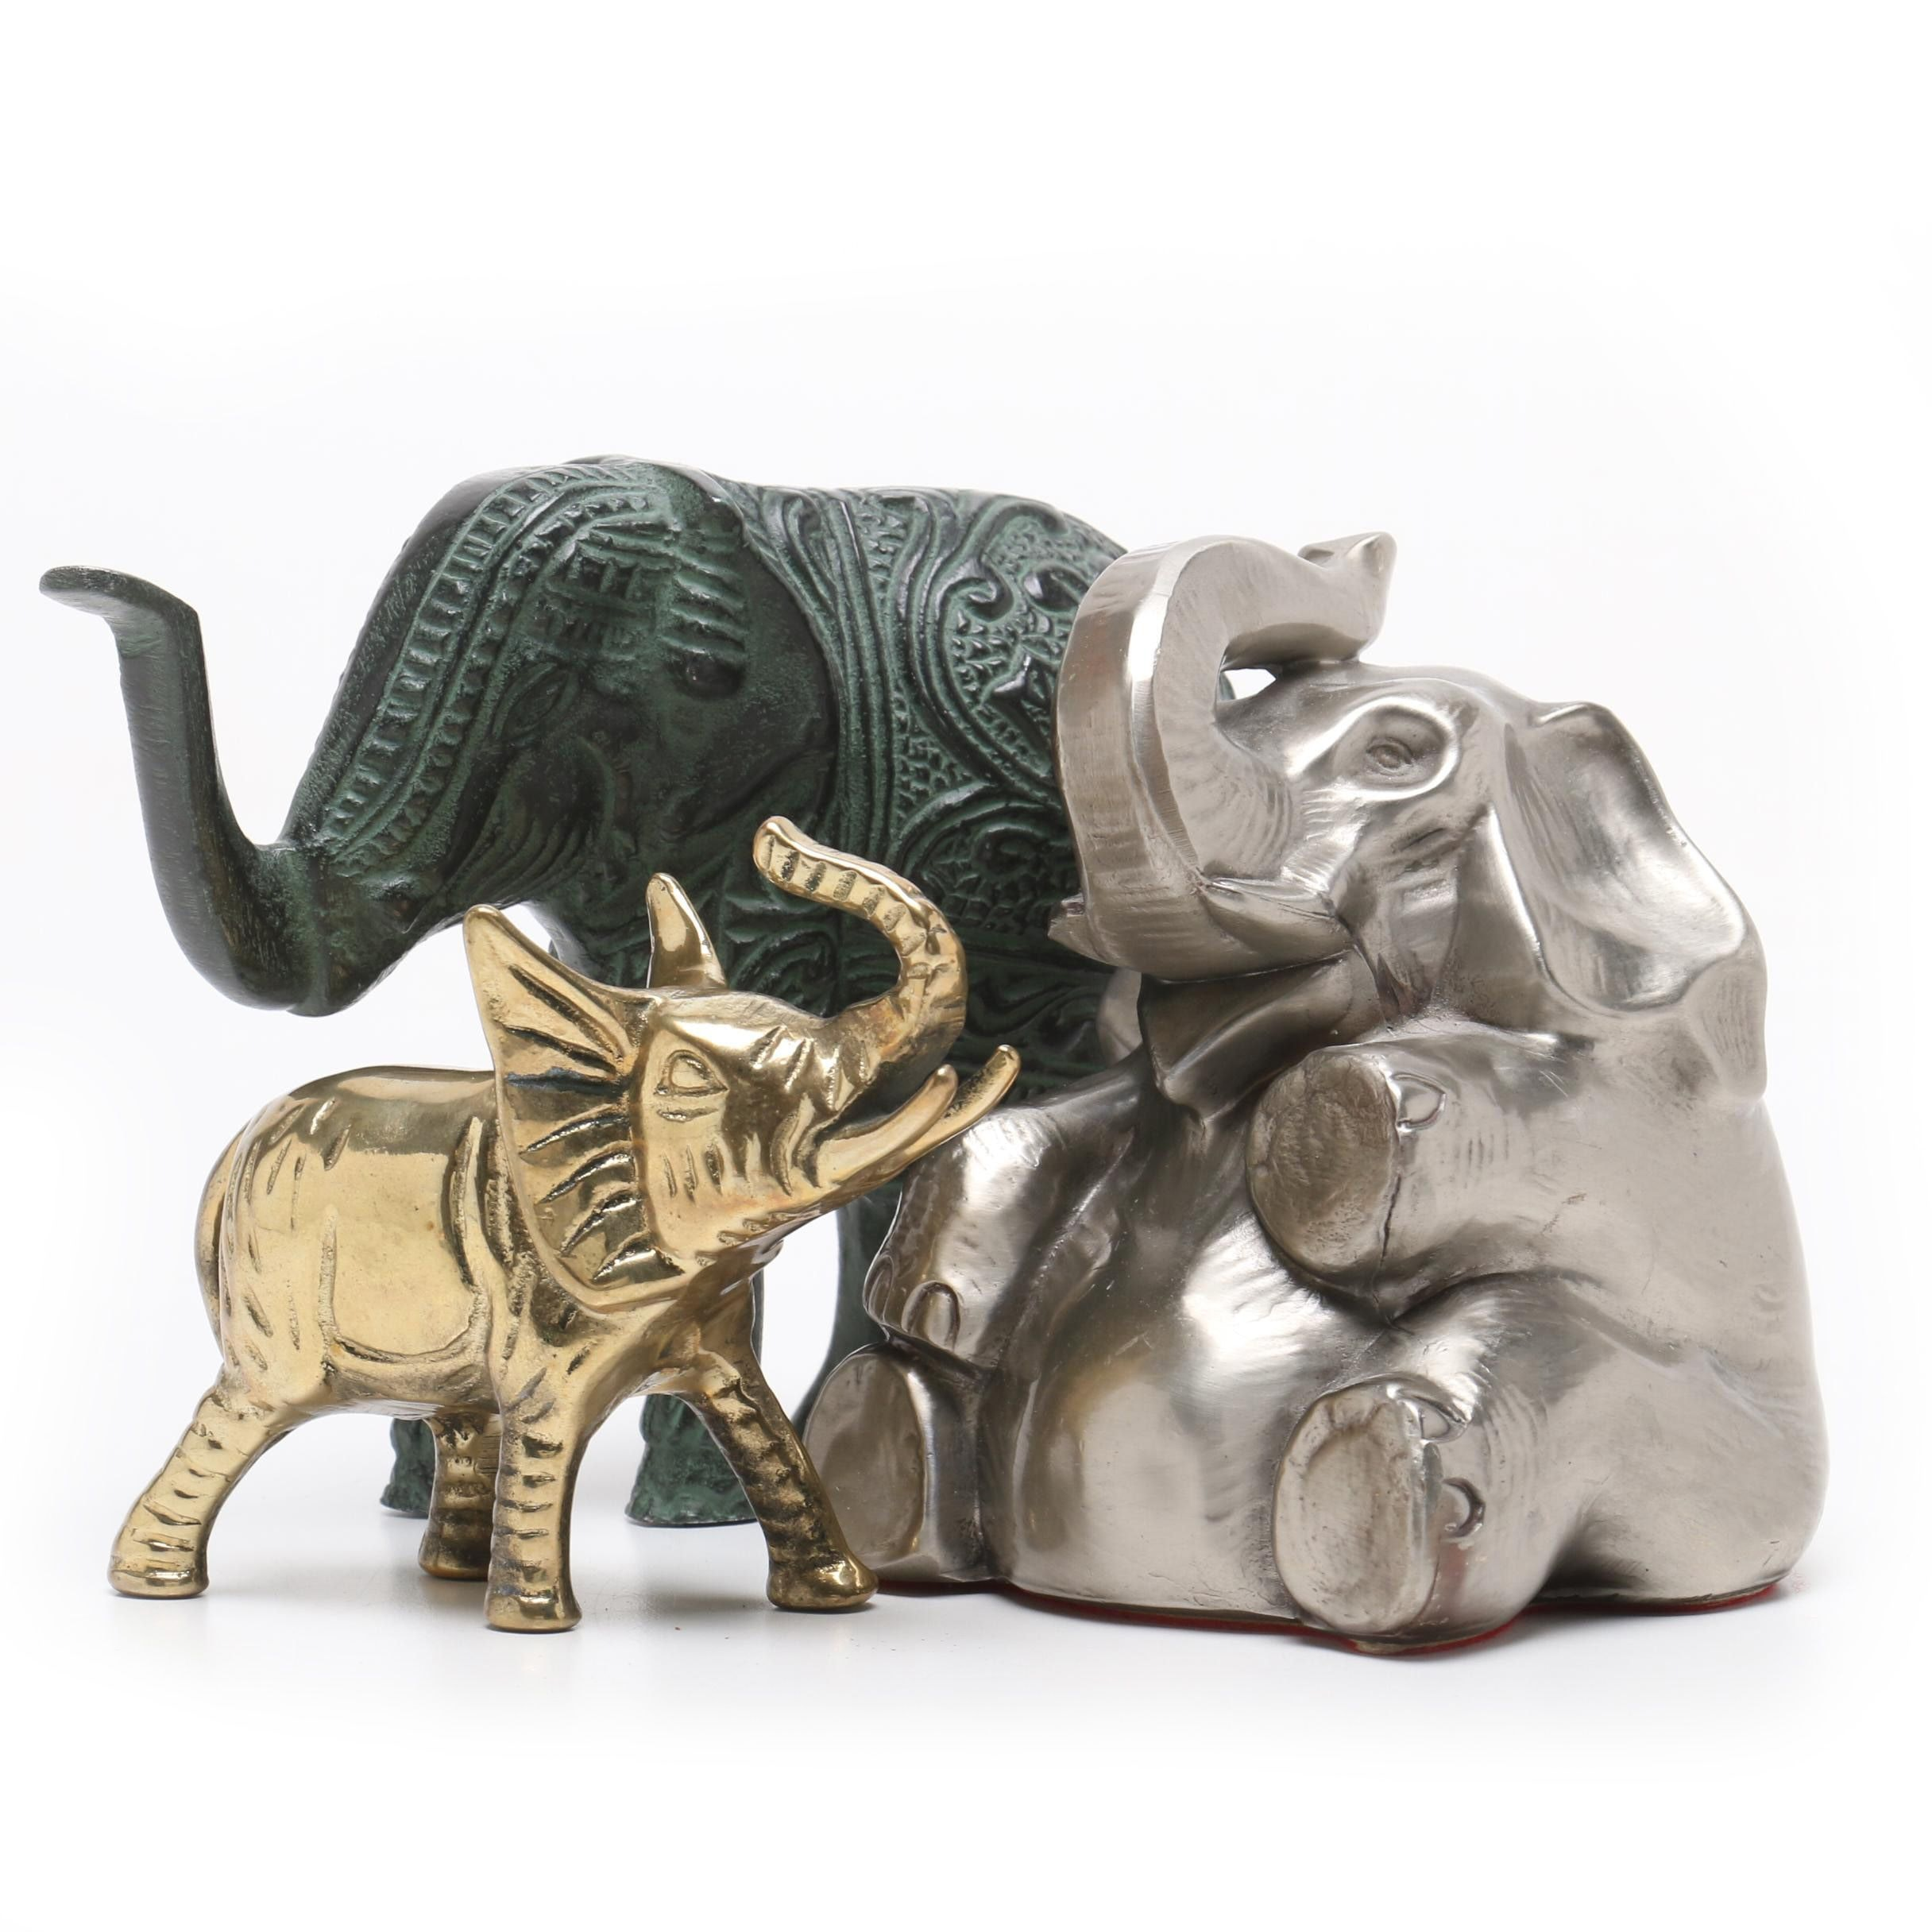 Group of Metal Elephant Figurines